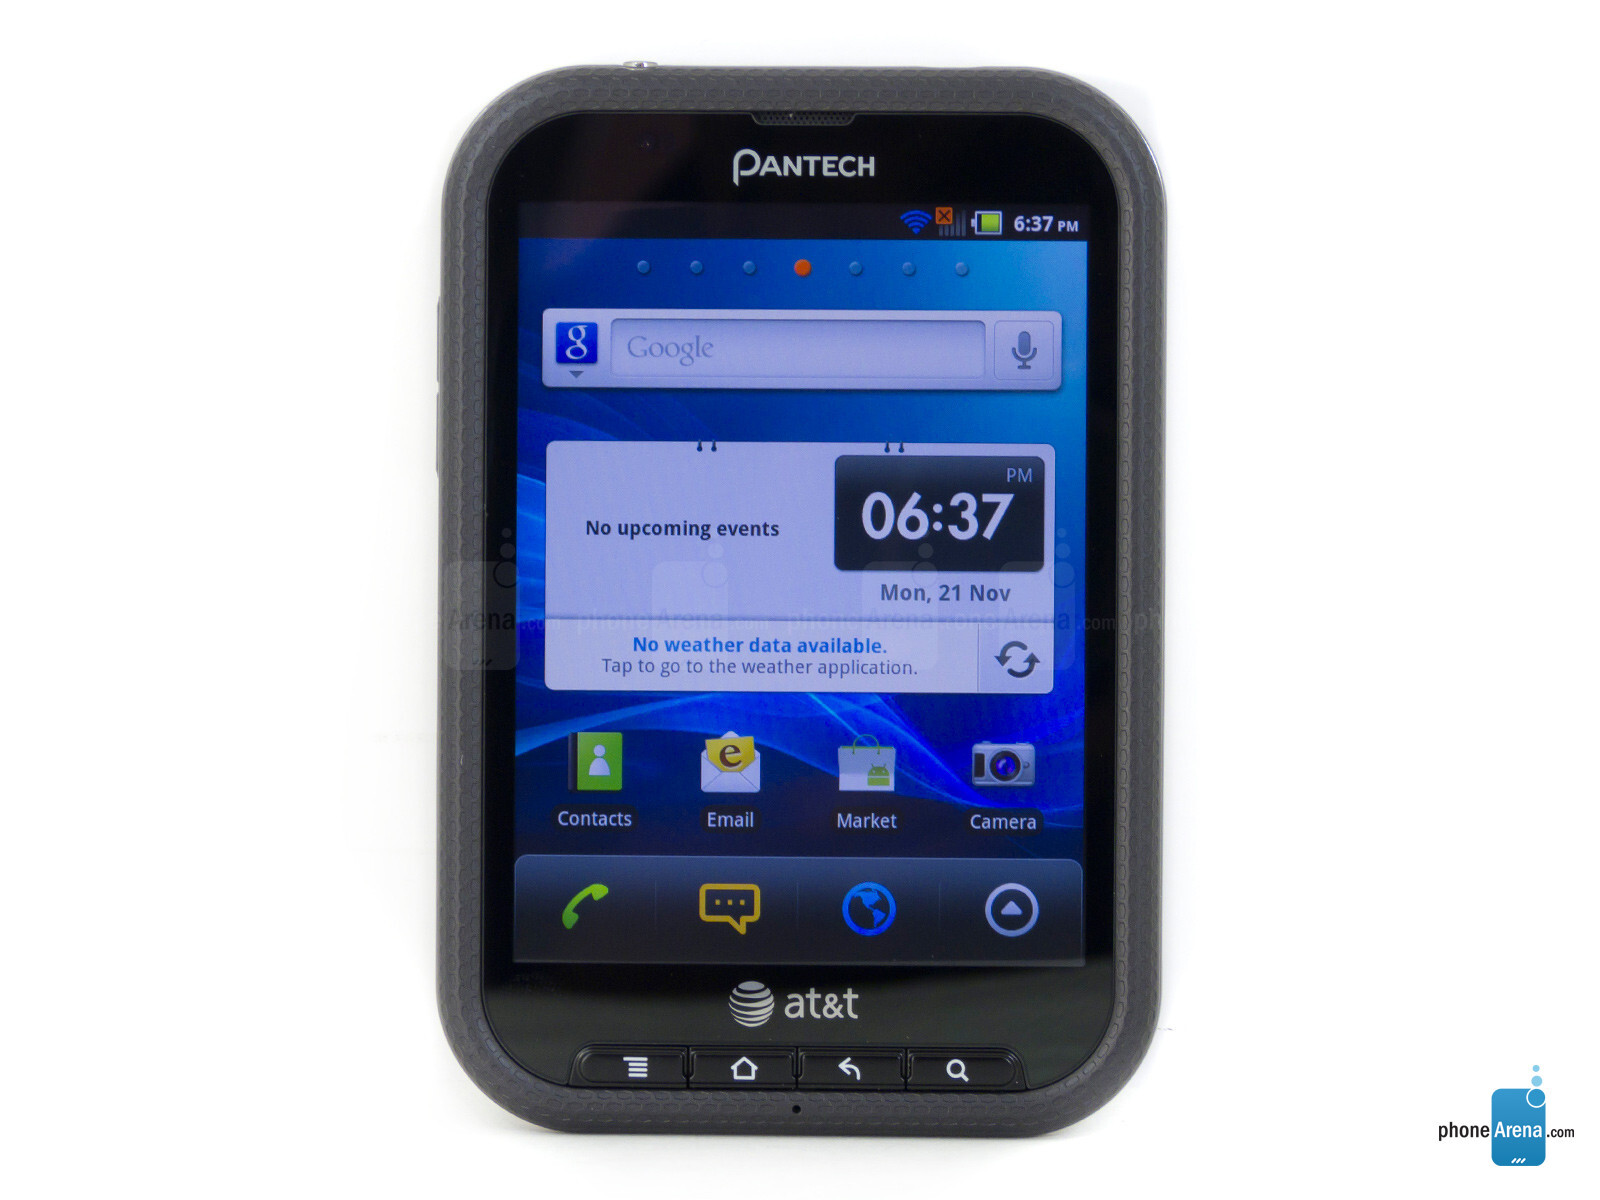 Pantech Pocket Specs